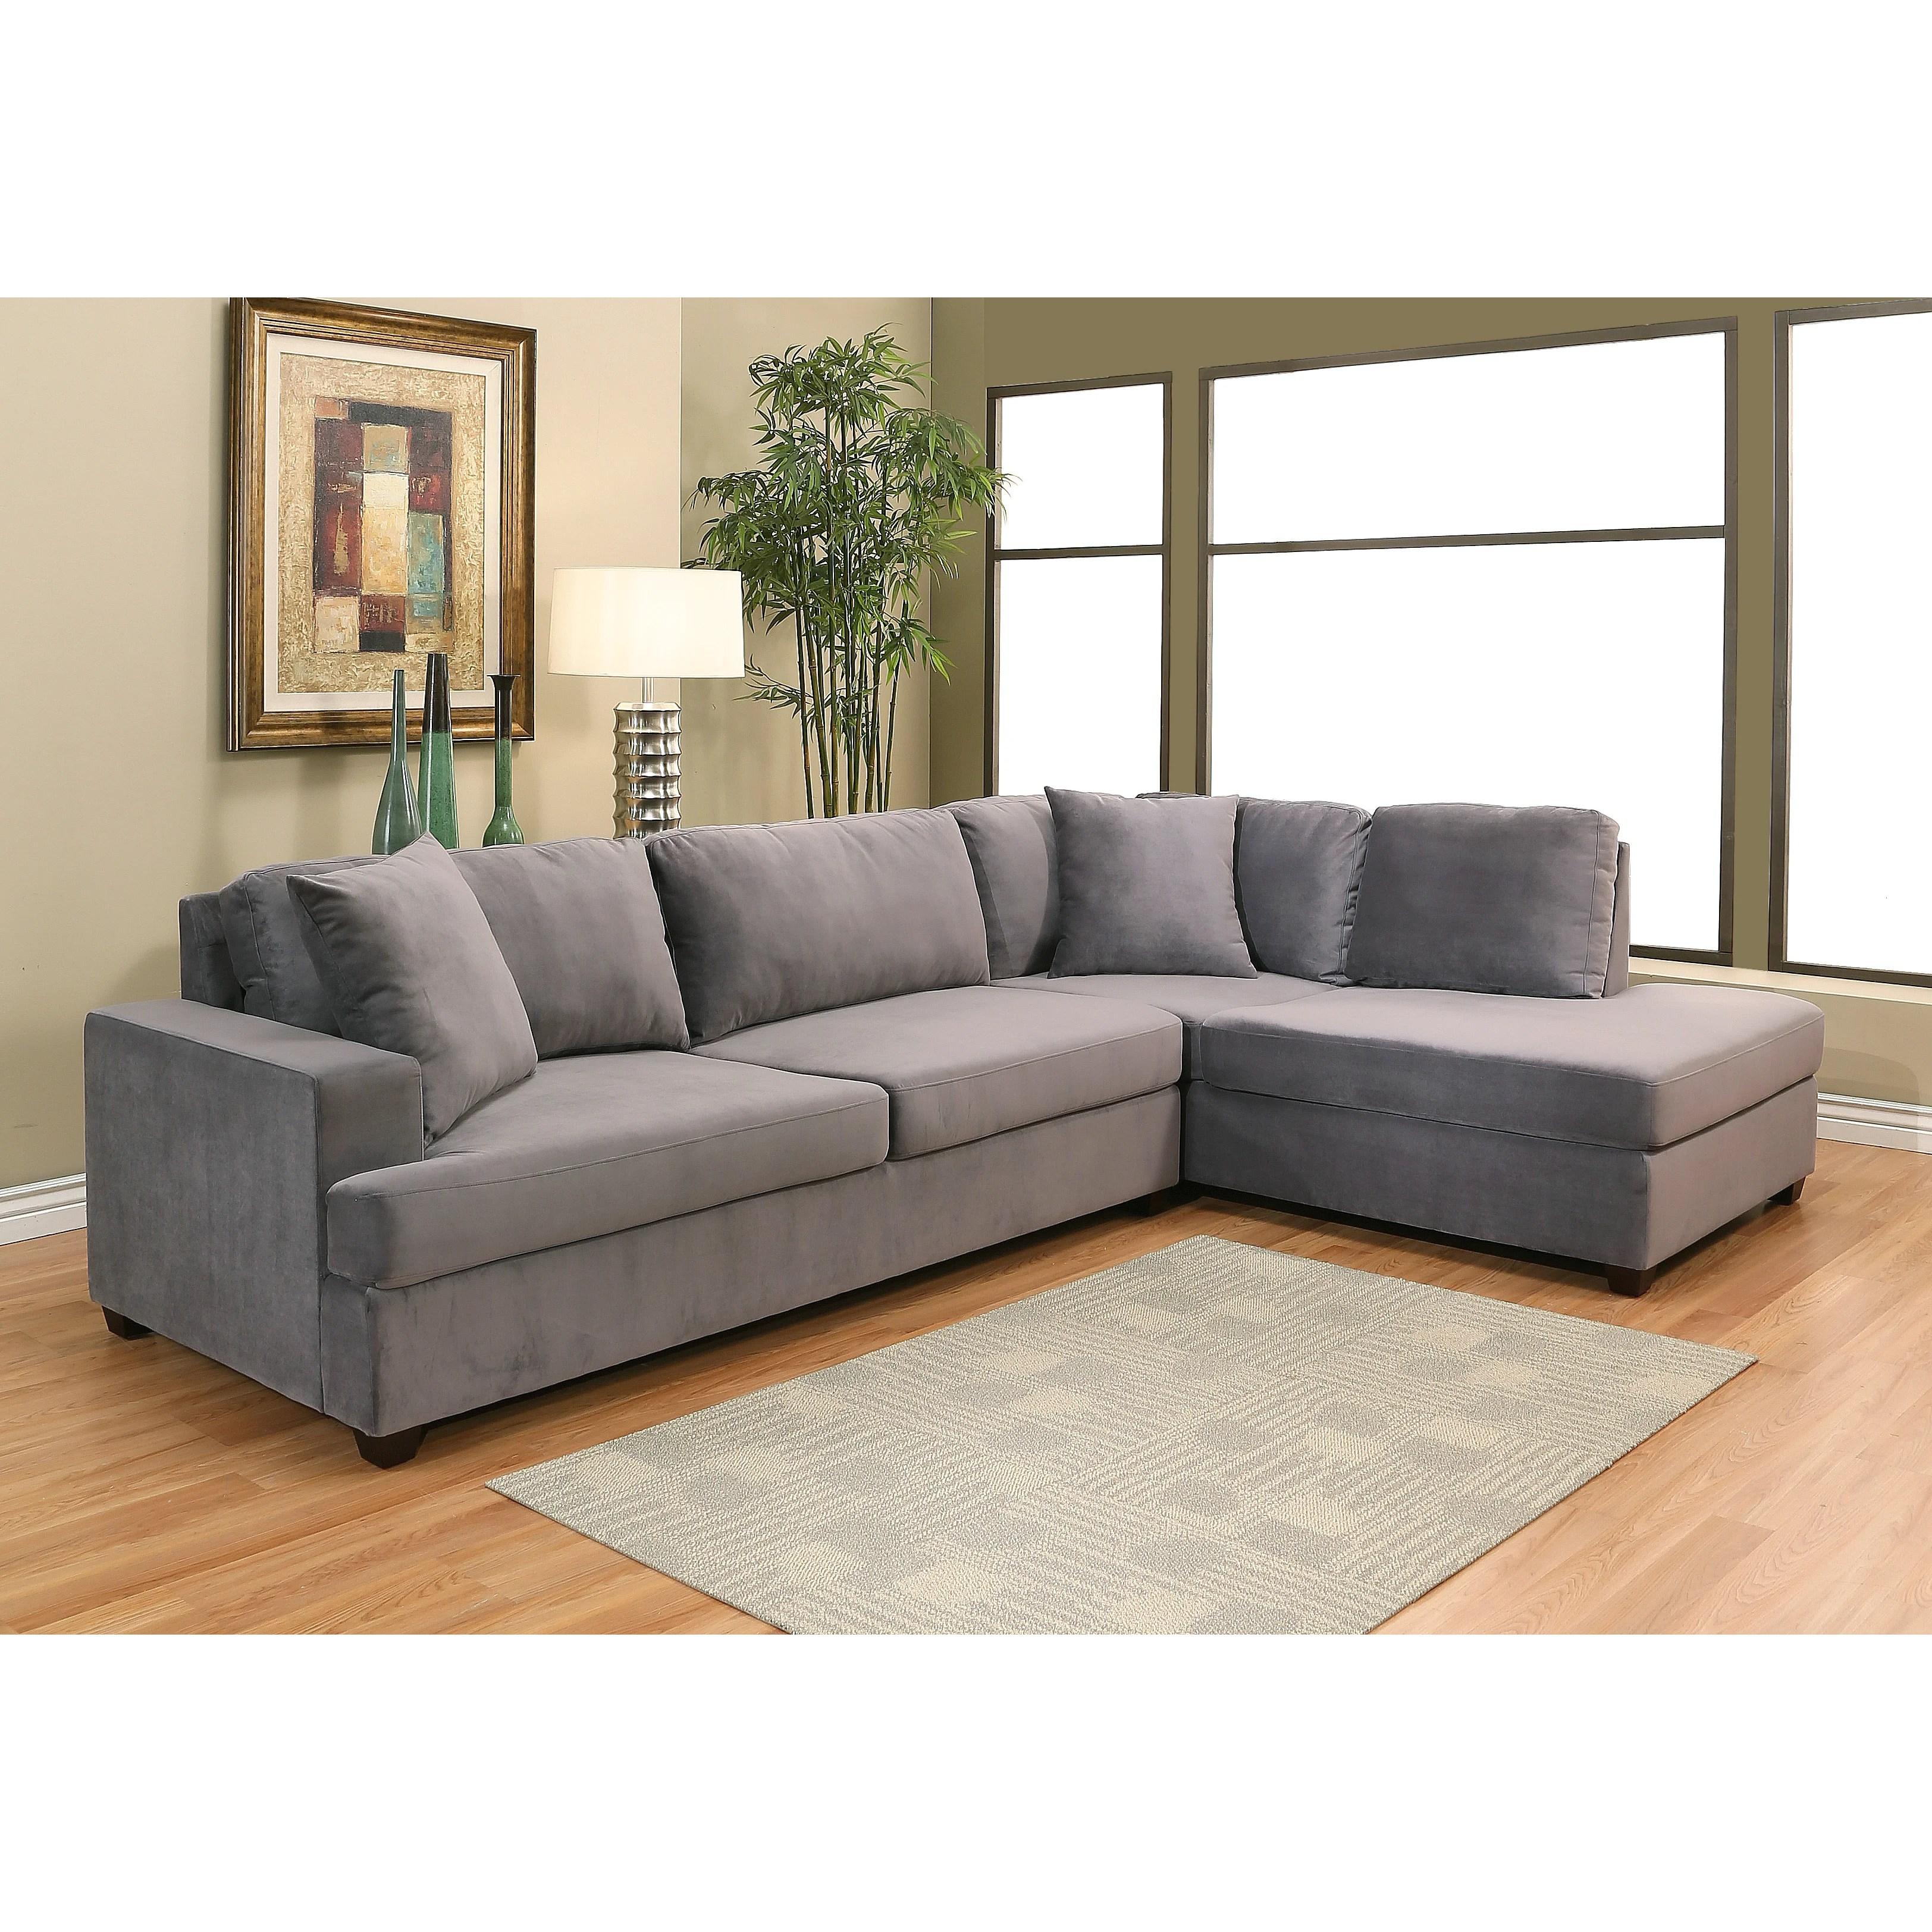 studio sofas chaises kivik sofa covers uk brayden berryhill chaise sectional wayfair ca